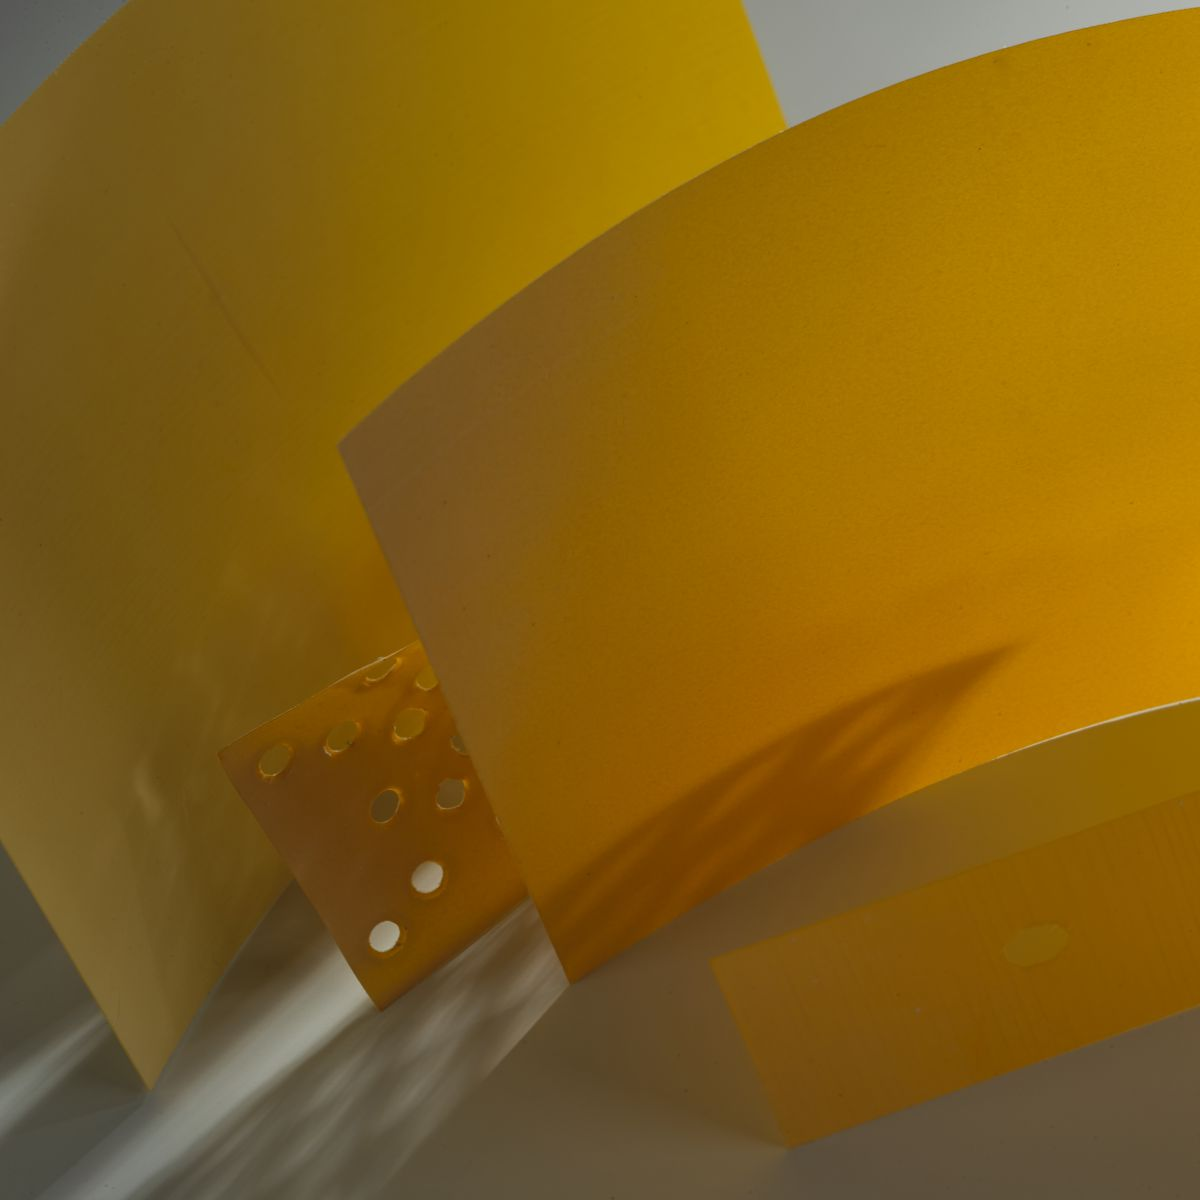 045 wmk warmtegeleidend kapton mt met phase change coating